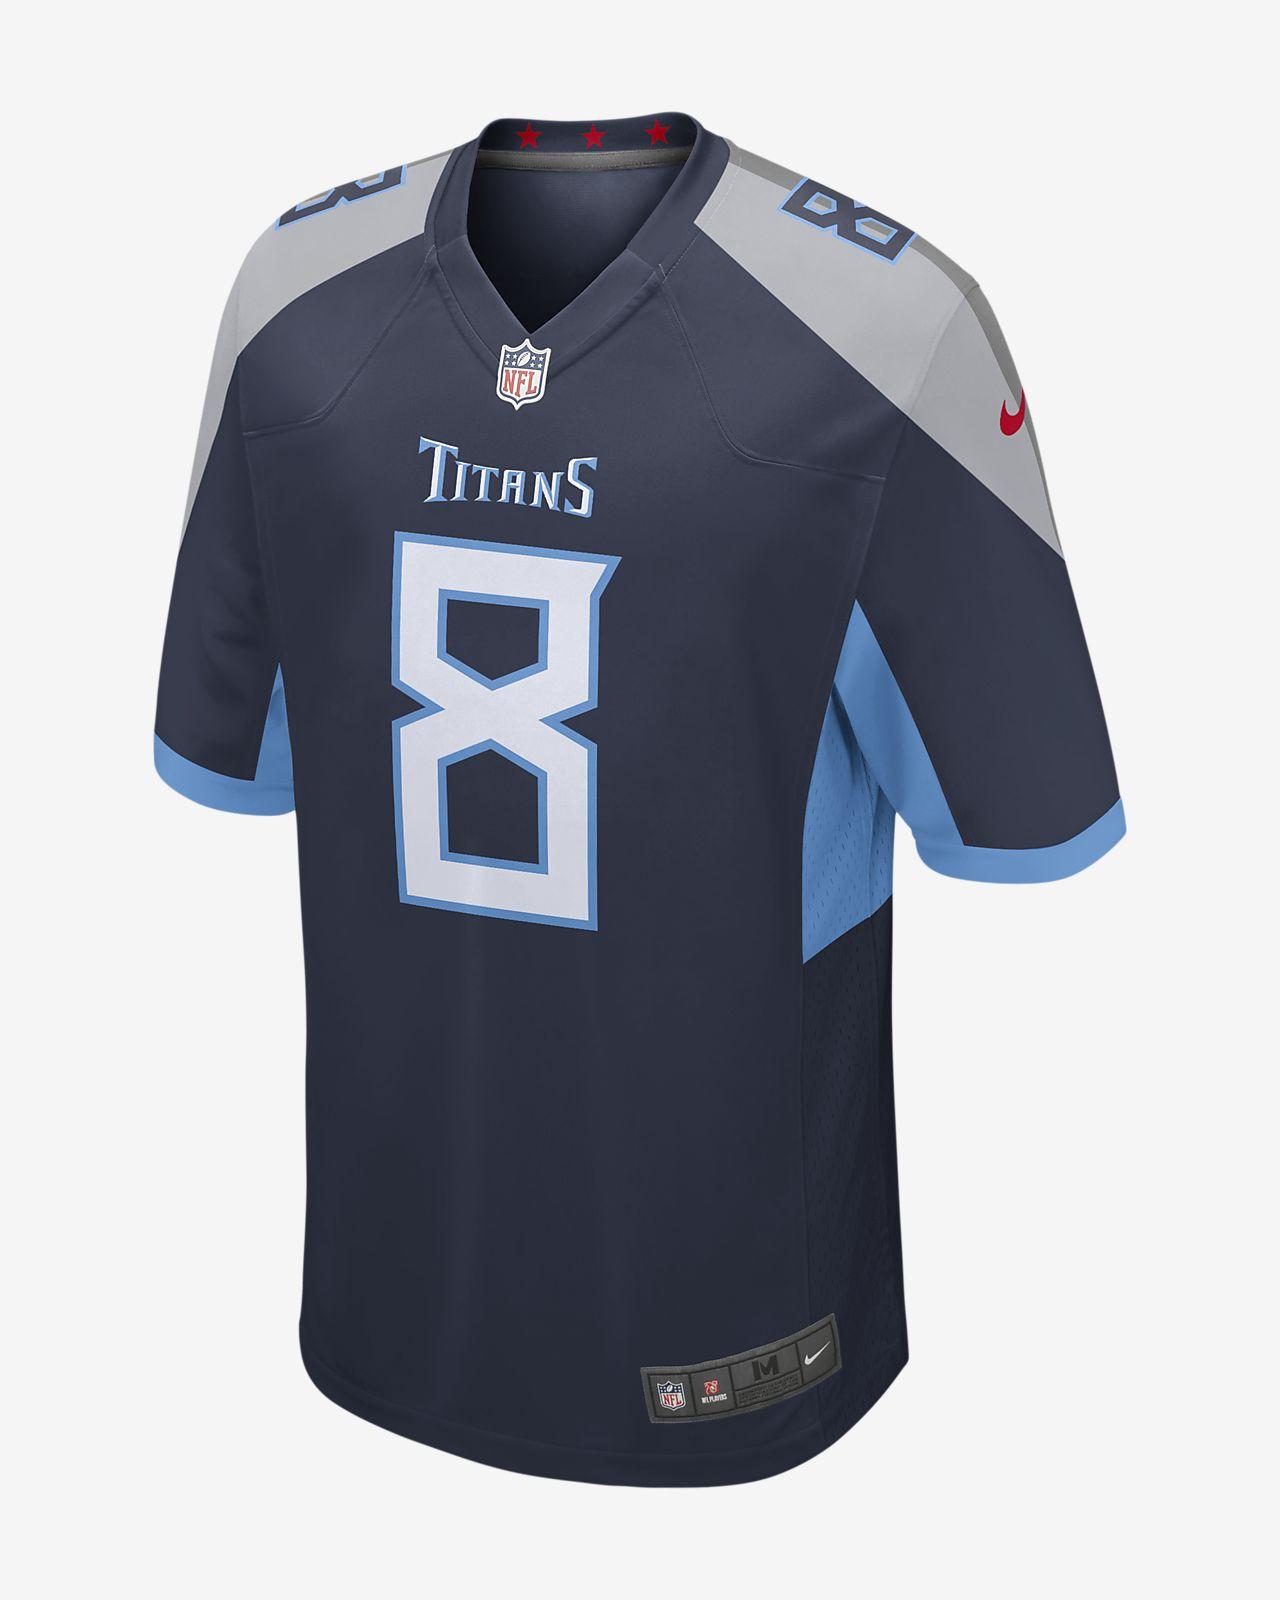 Camiseta de fútbol americano para hombre NFL Tennessee Titans Game Jersey (Marcus Mariota)